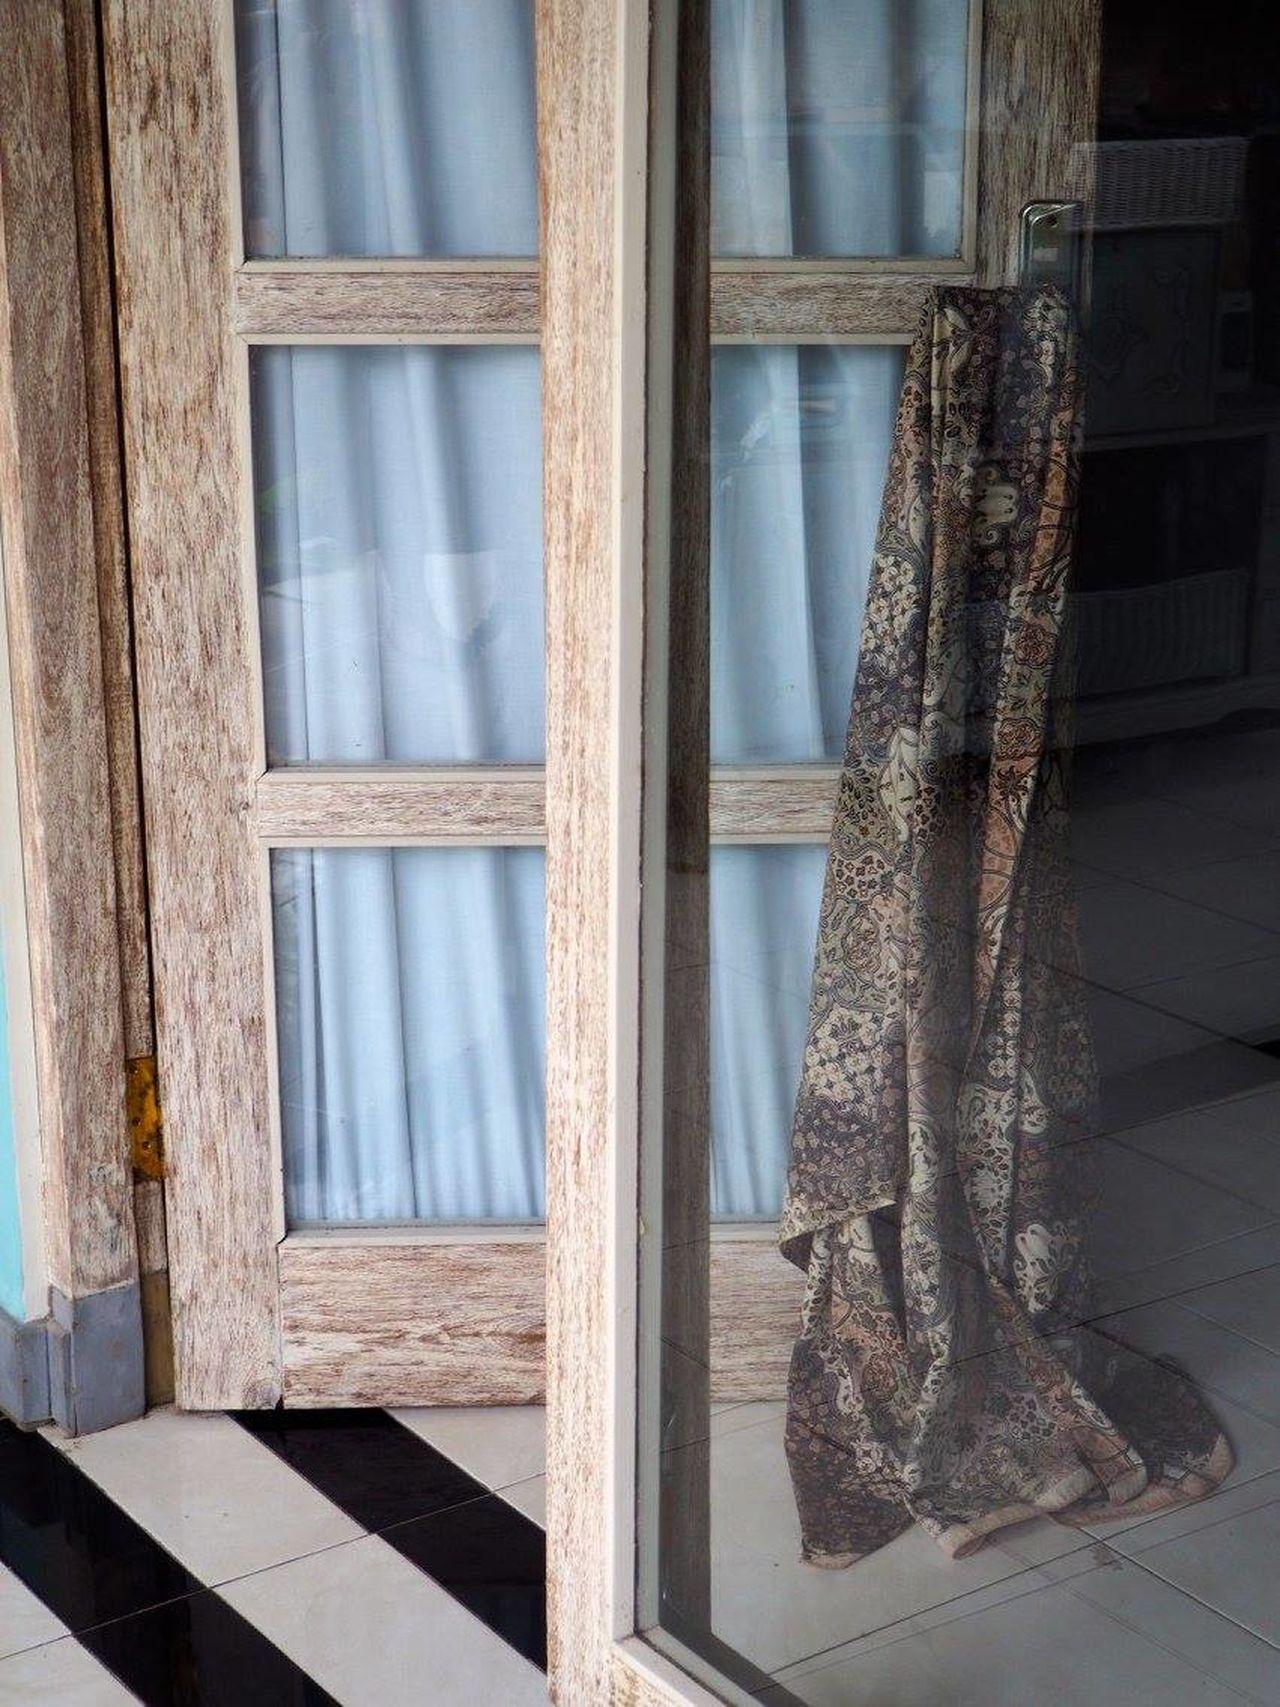 Beautiful stock photos of bali, window, close-up, day, blue